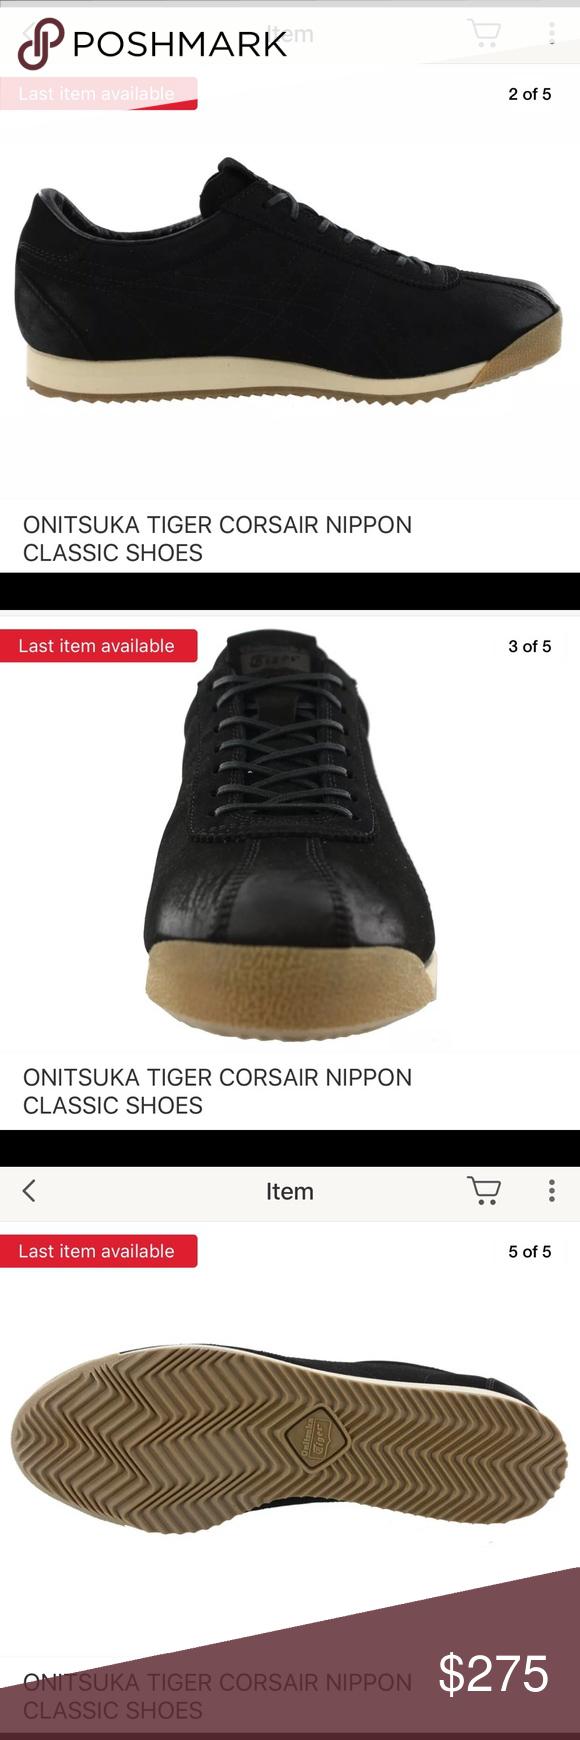 huge selection of 2eb02 2b6fd ASICS Onitsuka Tiger Corsair Nippon sneakers New Brand New ...